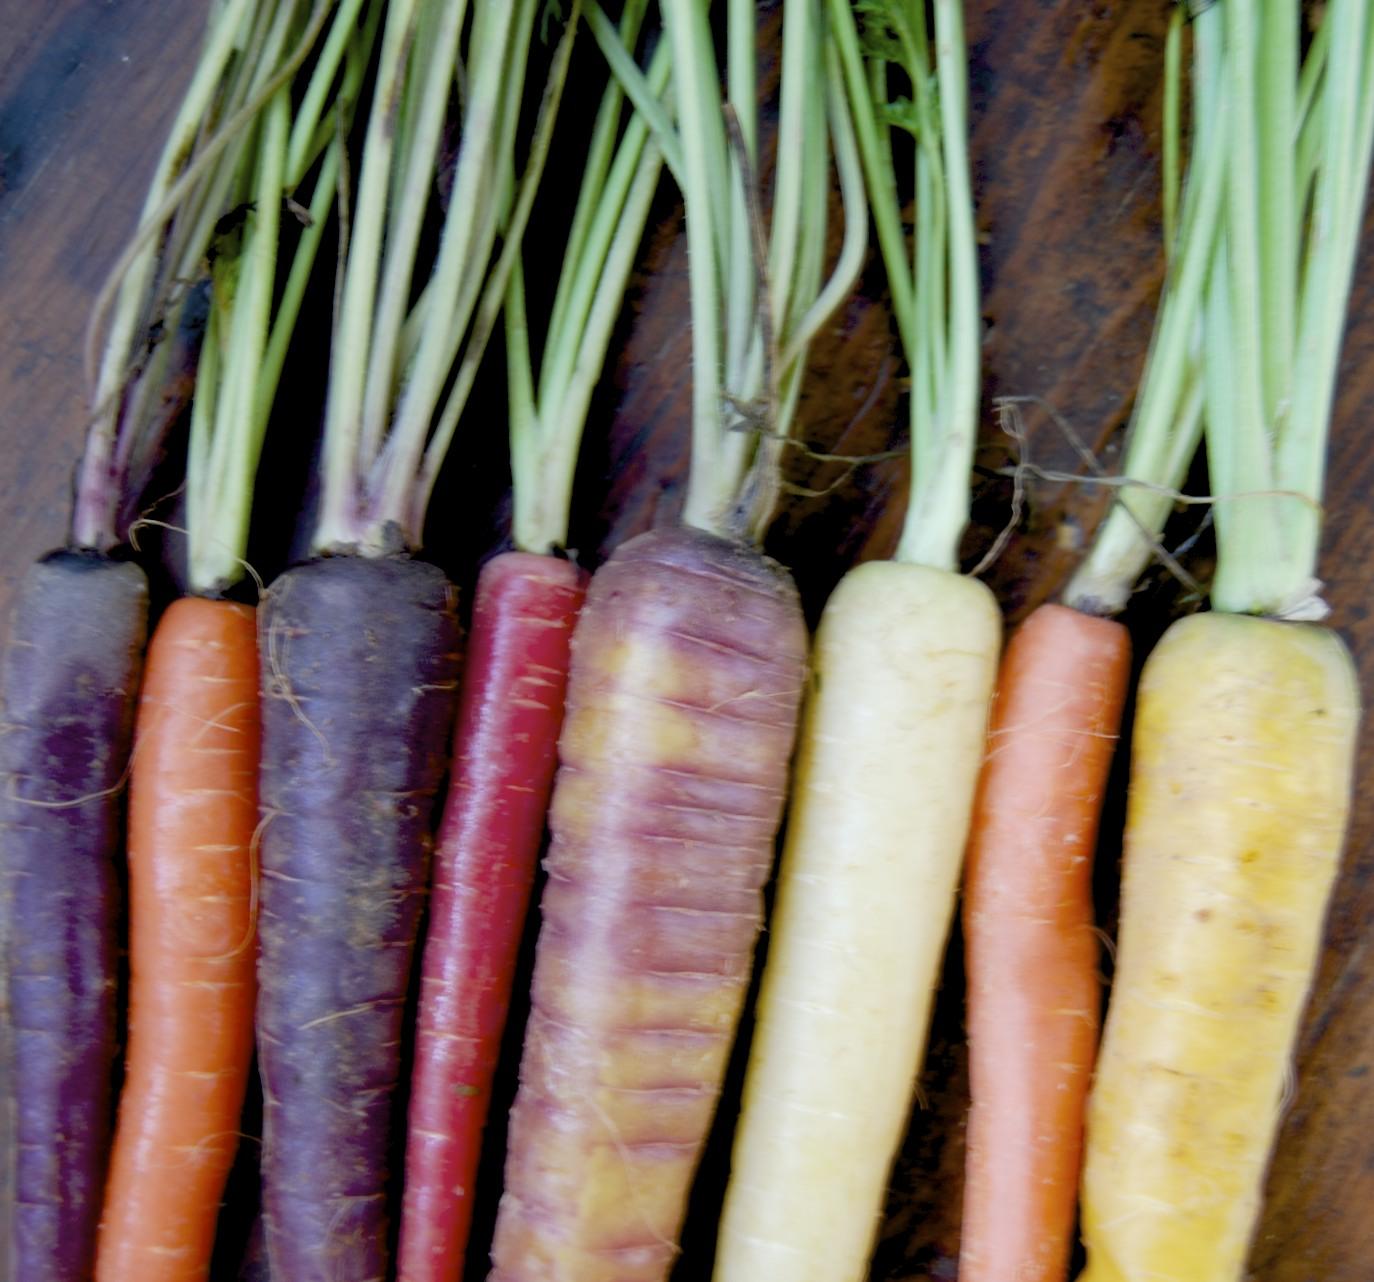 Organic Rainbow Carrots Organic Rainbow Carrots